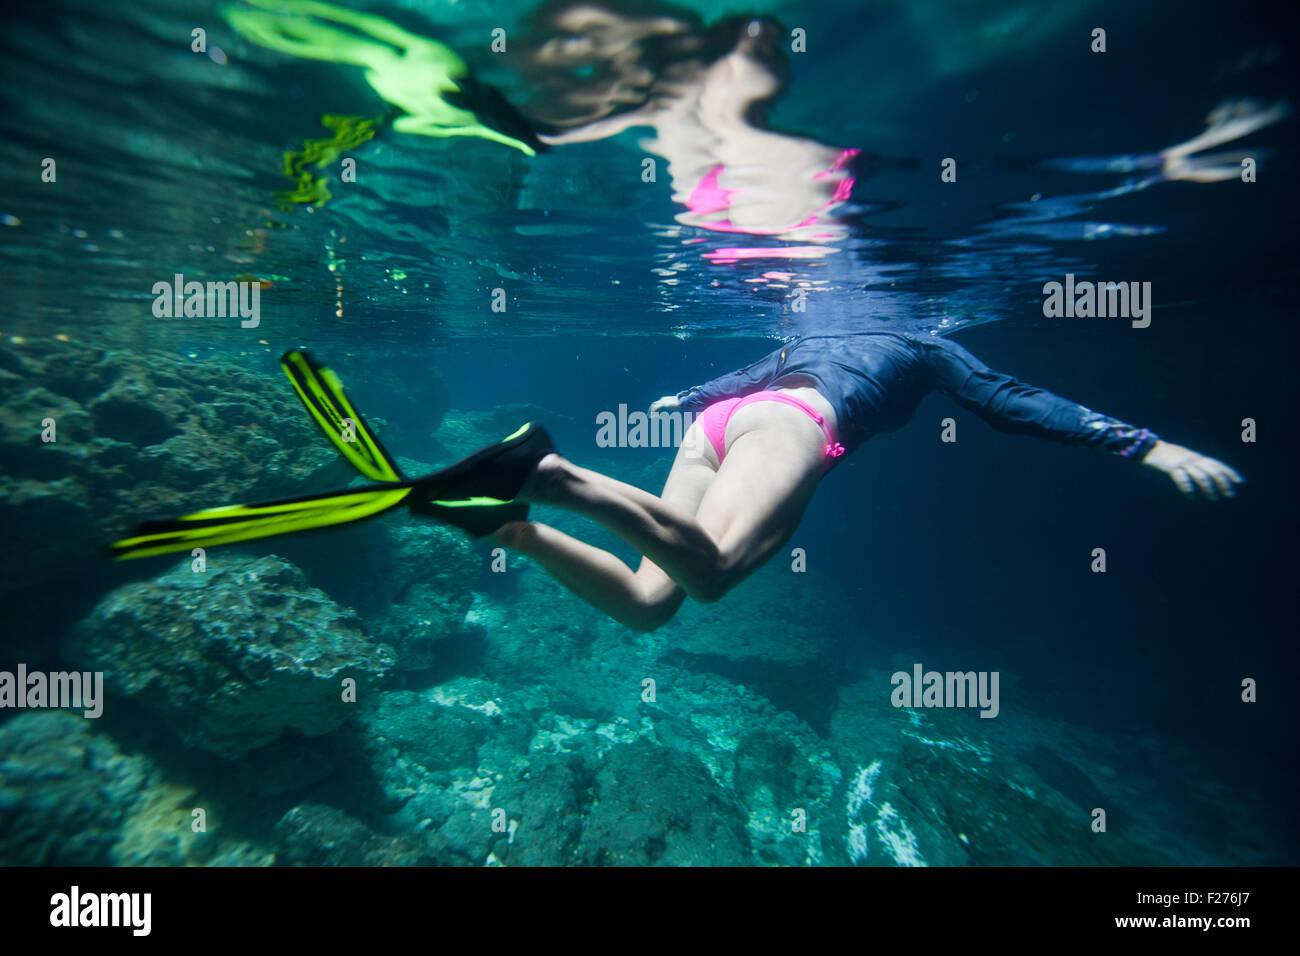 bikini clad Woman Snorkeling in Devils Den Underground Spring in Williston Florida - Stock Image